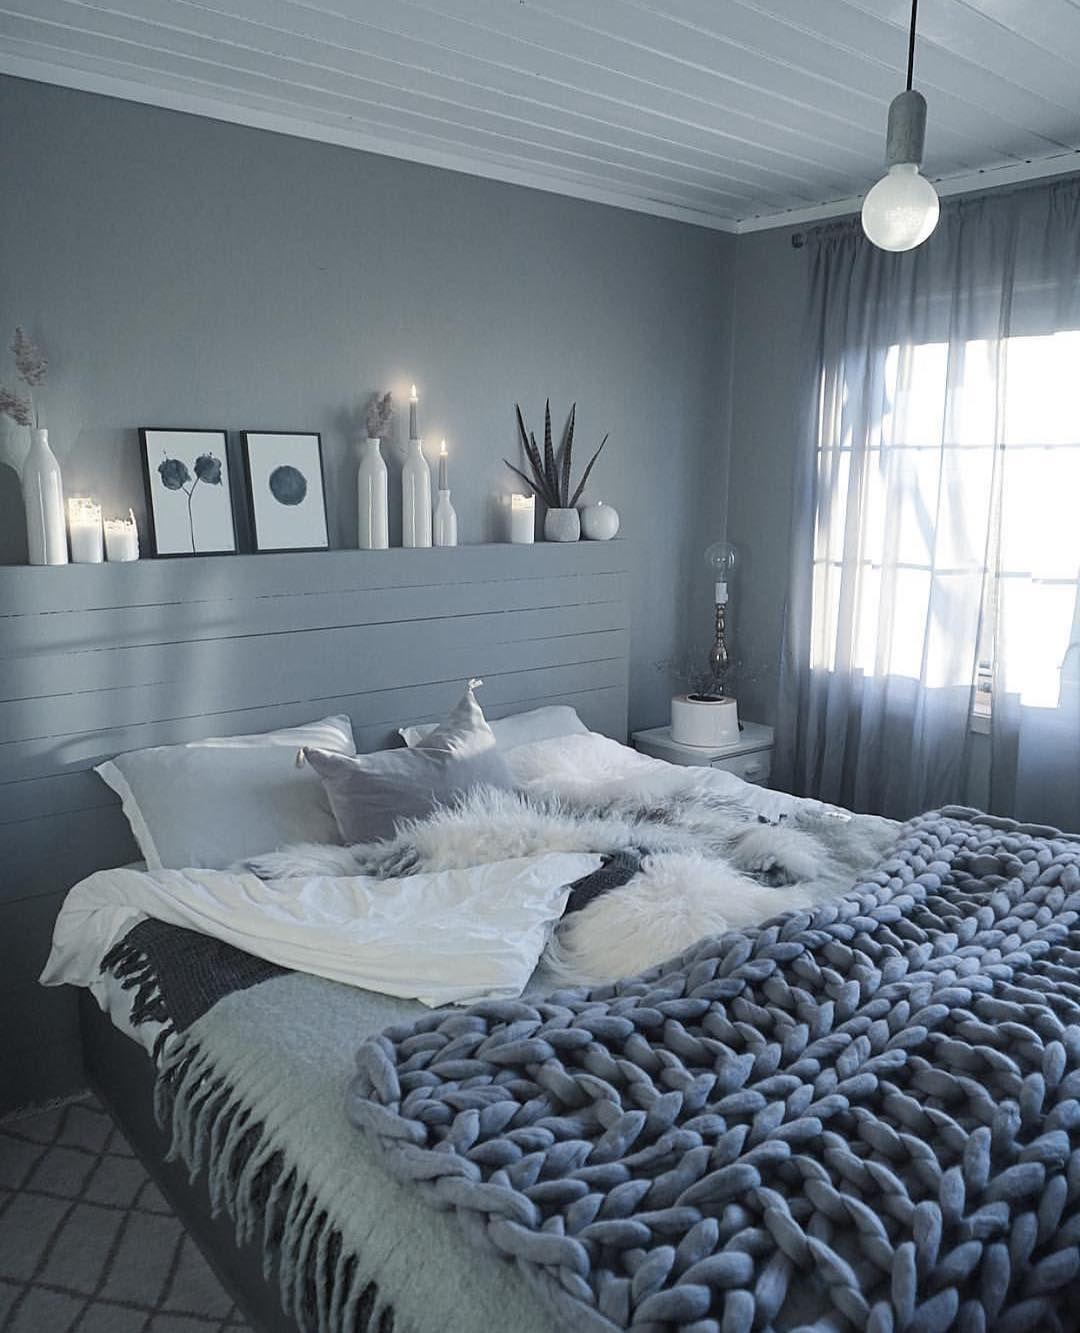 warna cat kamar tidur sempit abu abu | dekorasi kamar tidur di 2019